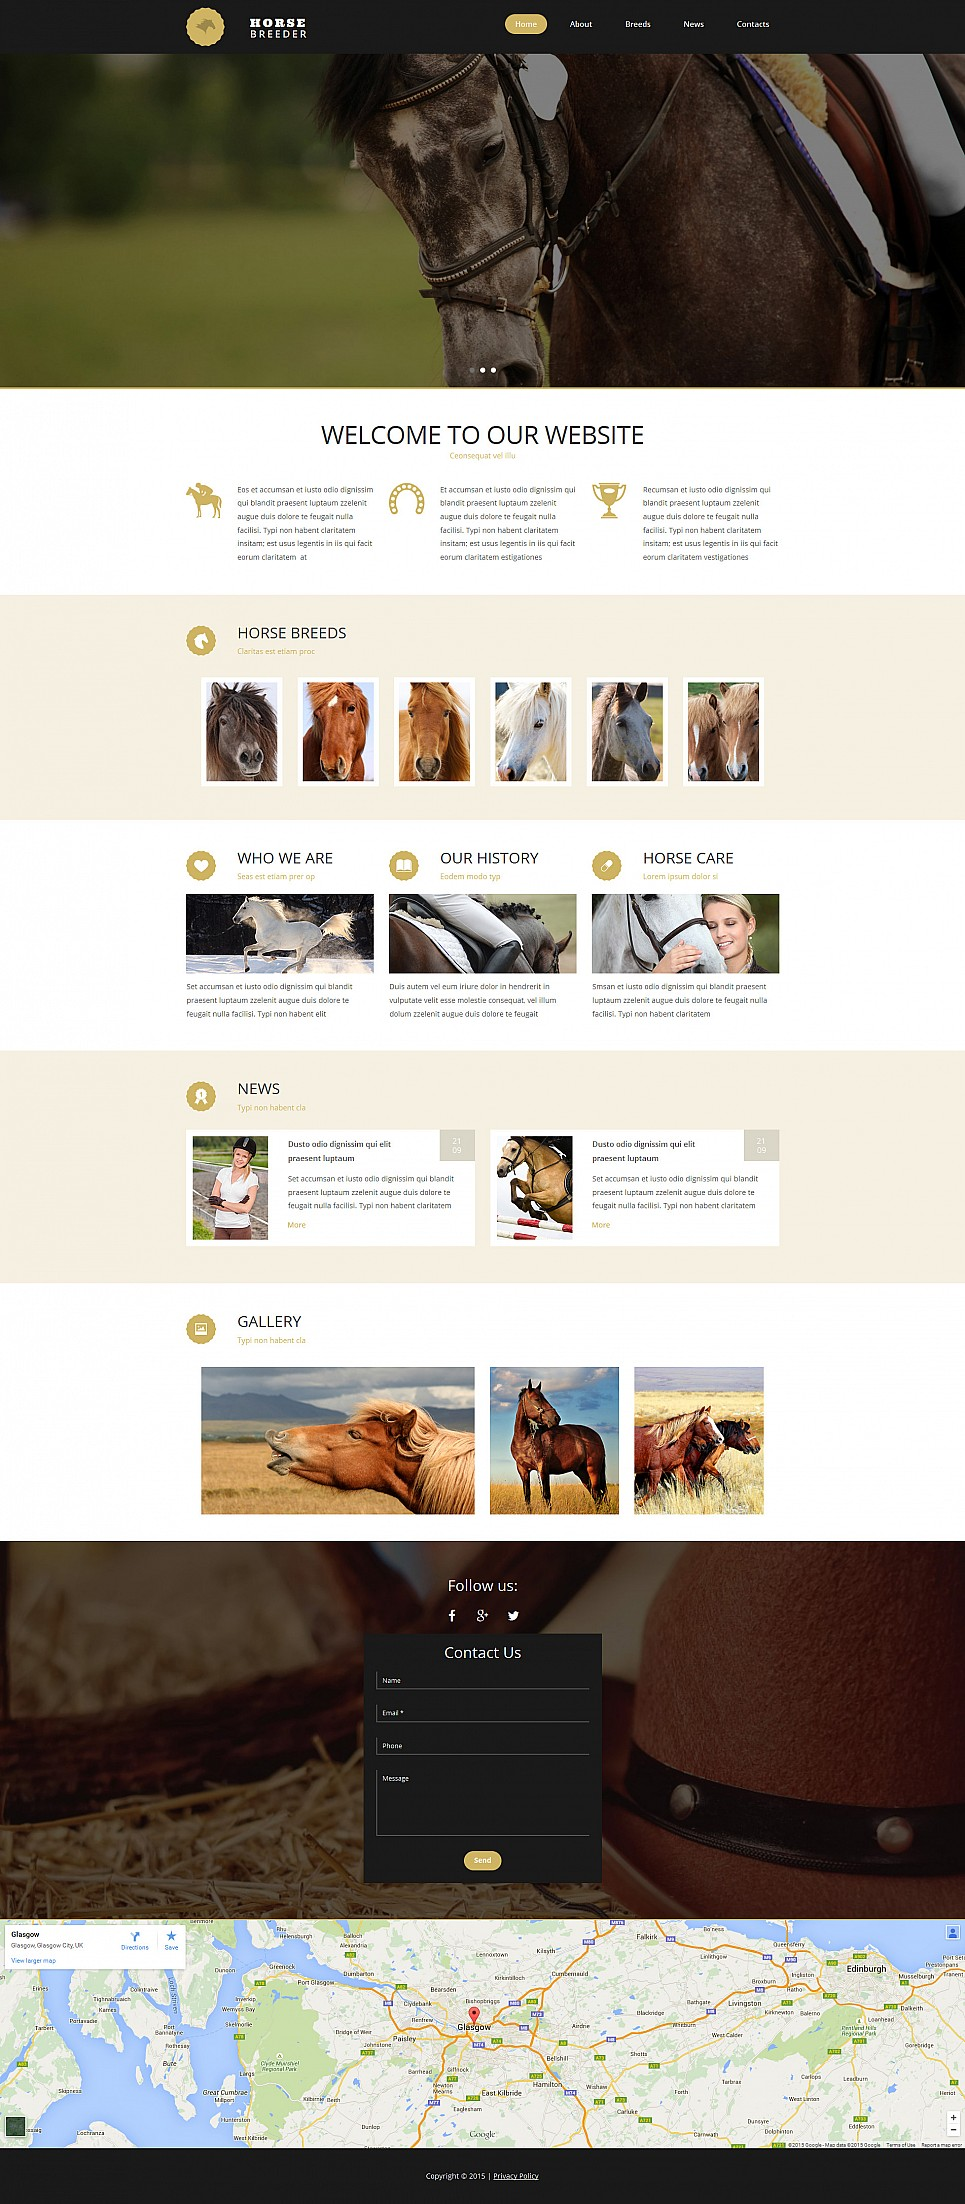 Website Template for Horse Breeding Farm - image